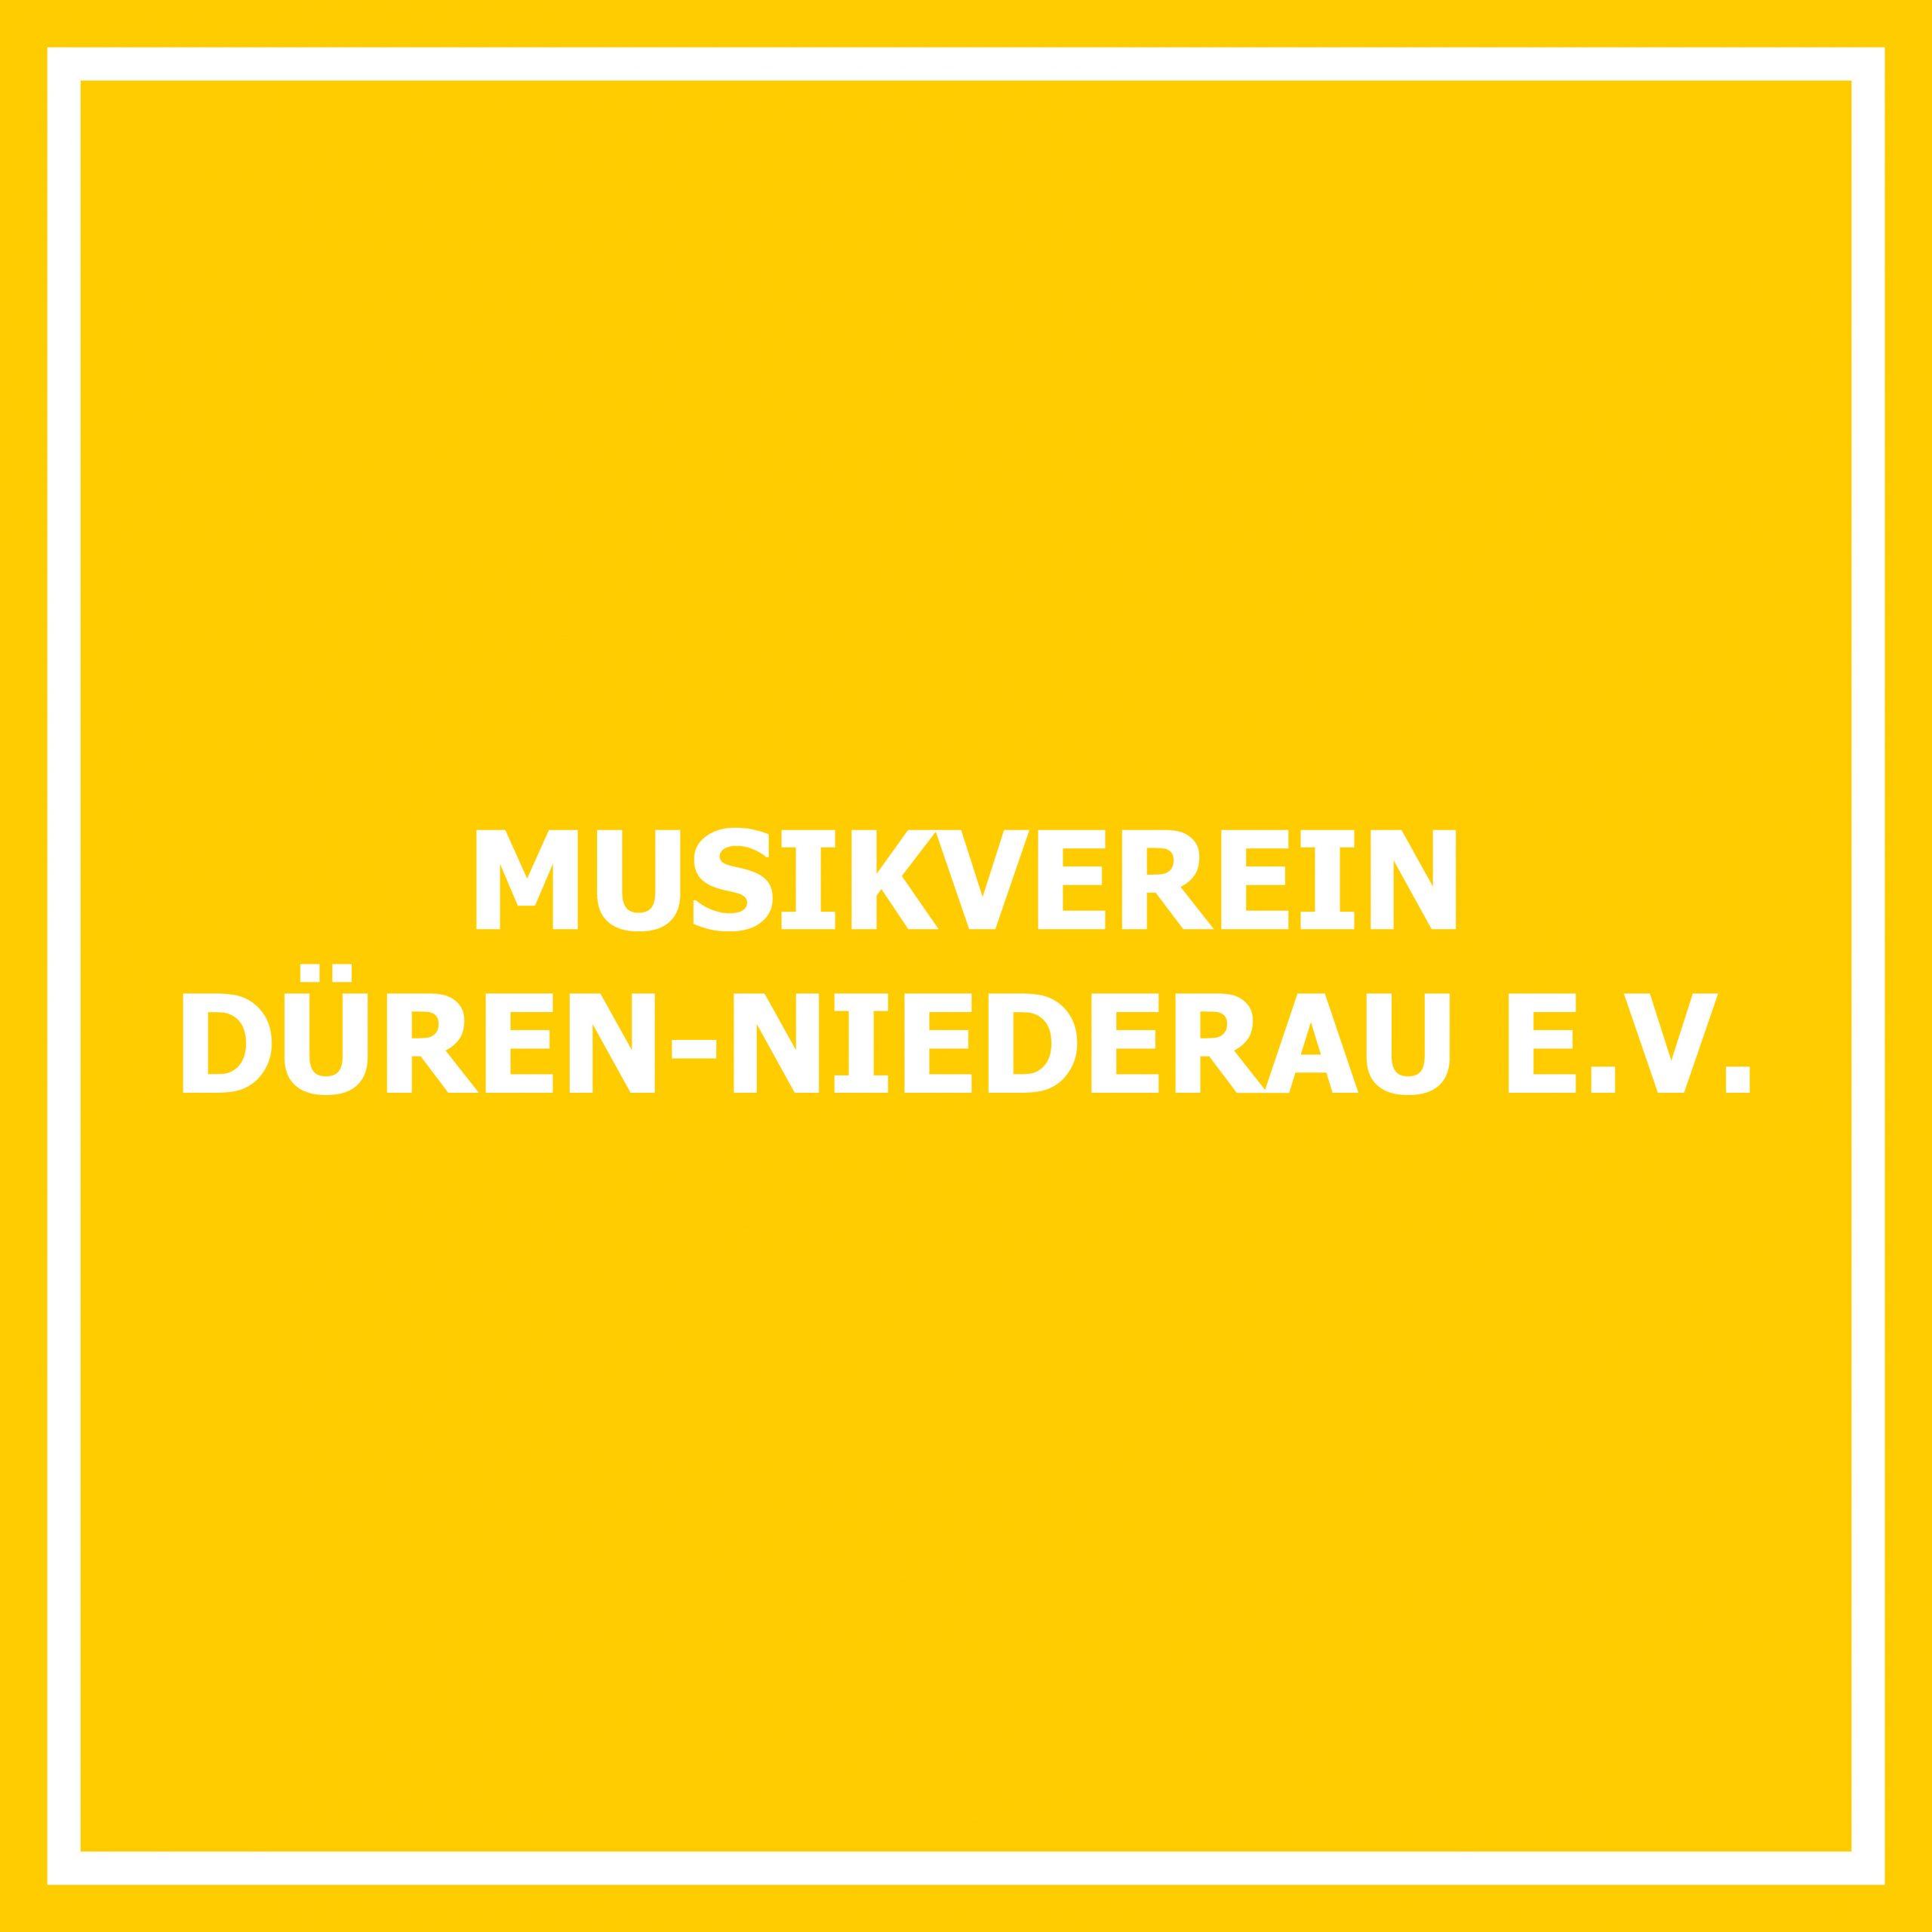 Musikverein Düren-Niederau